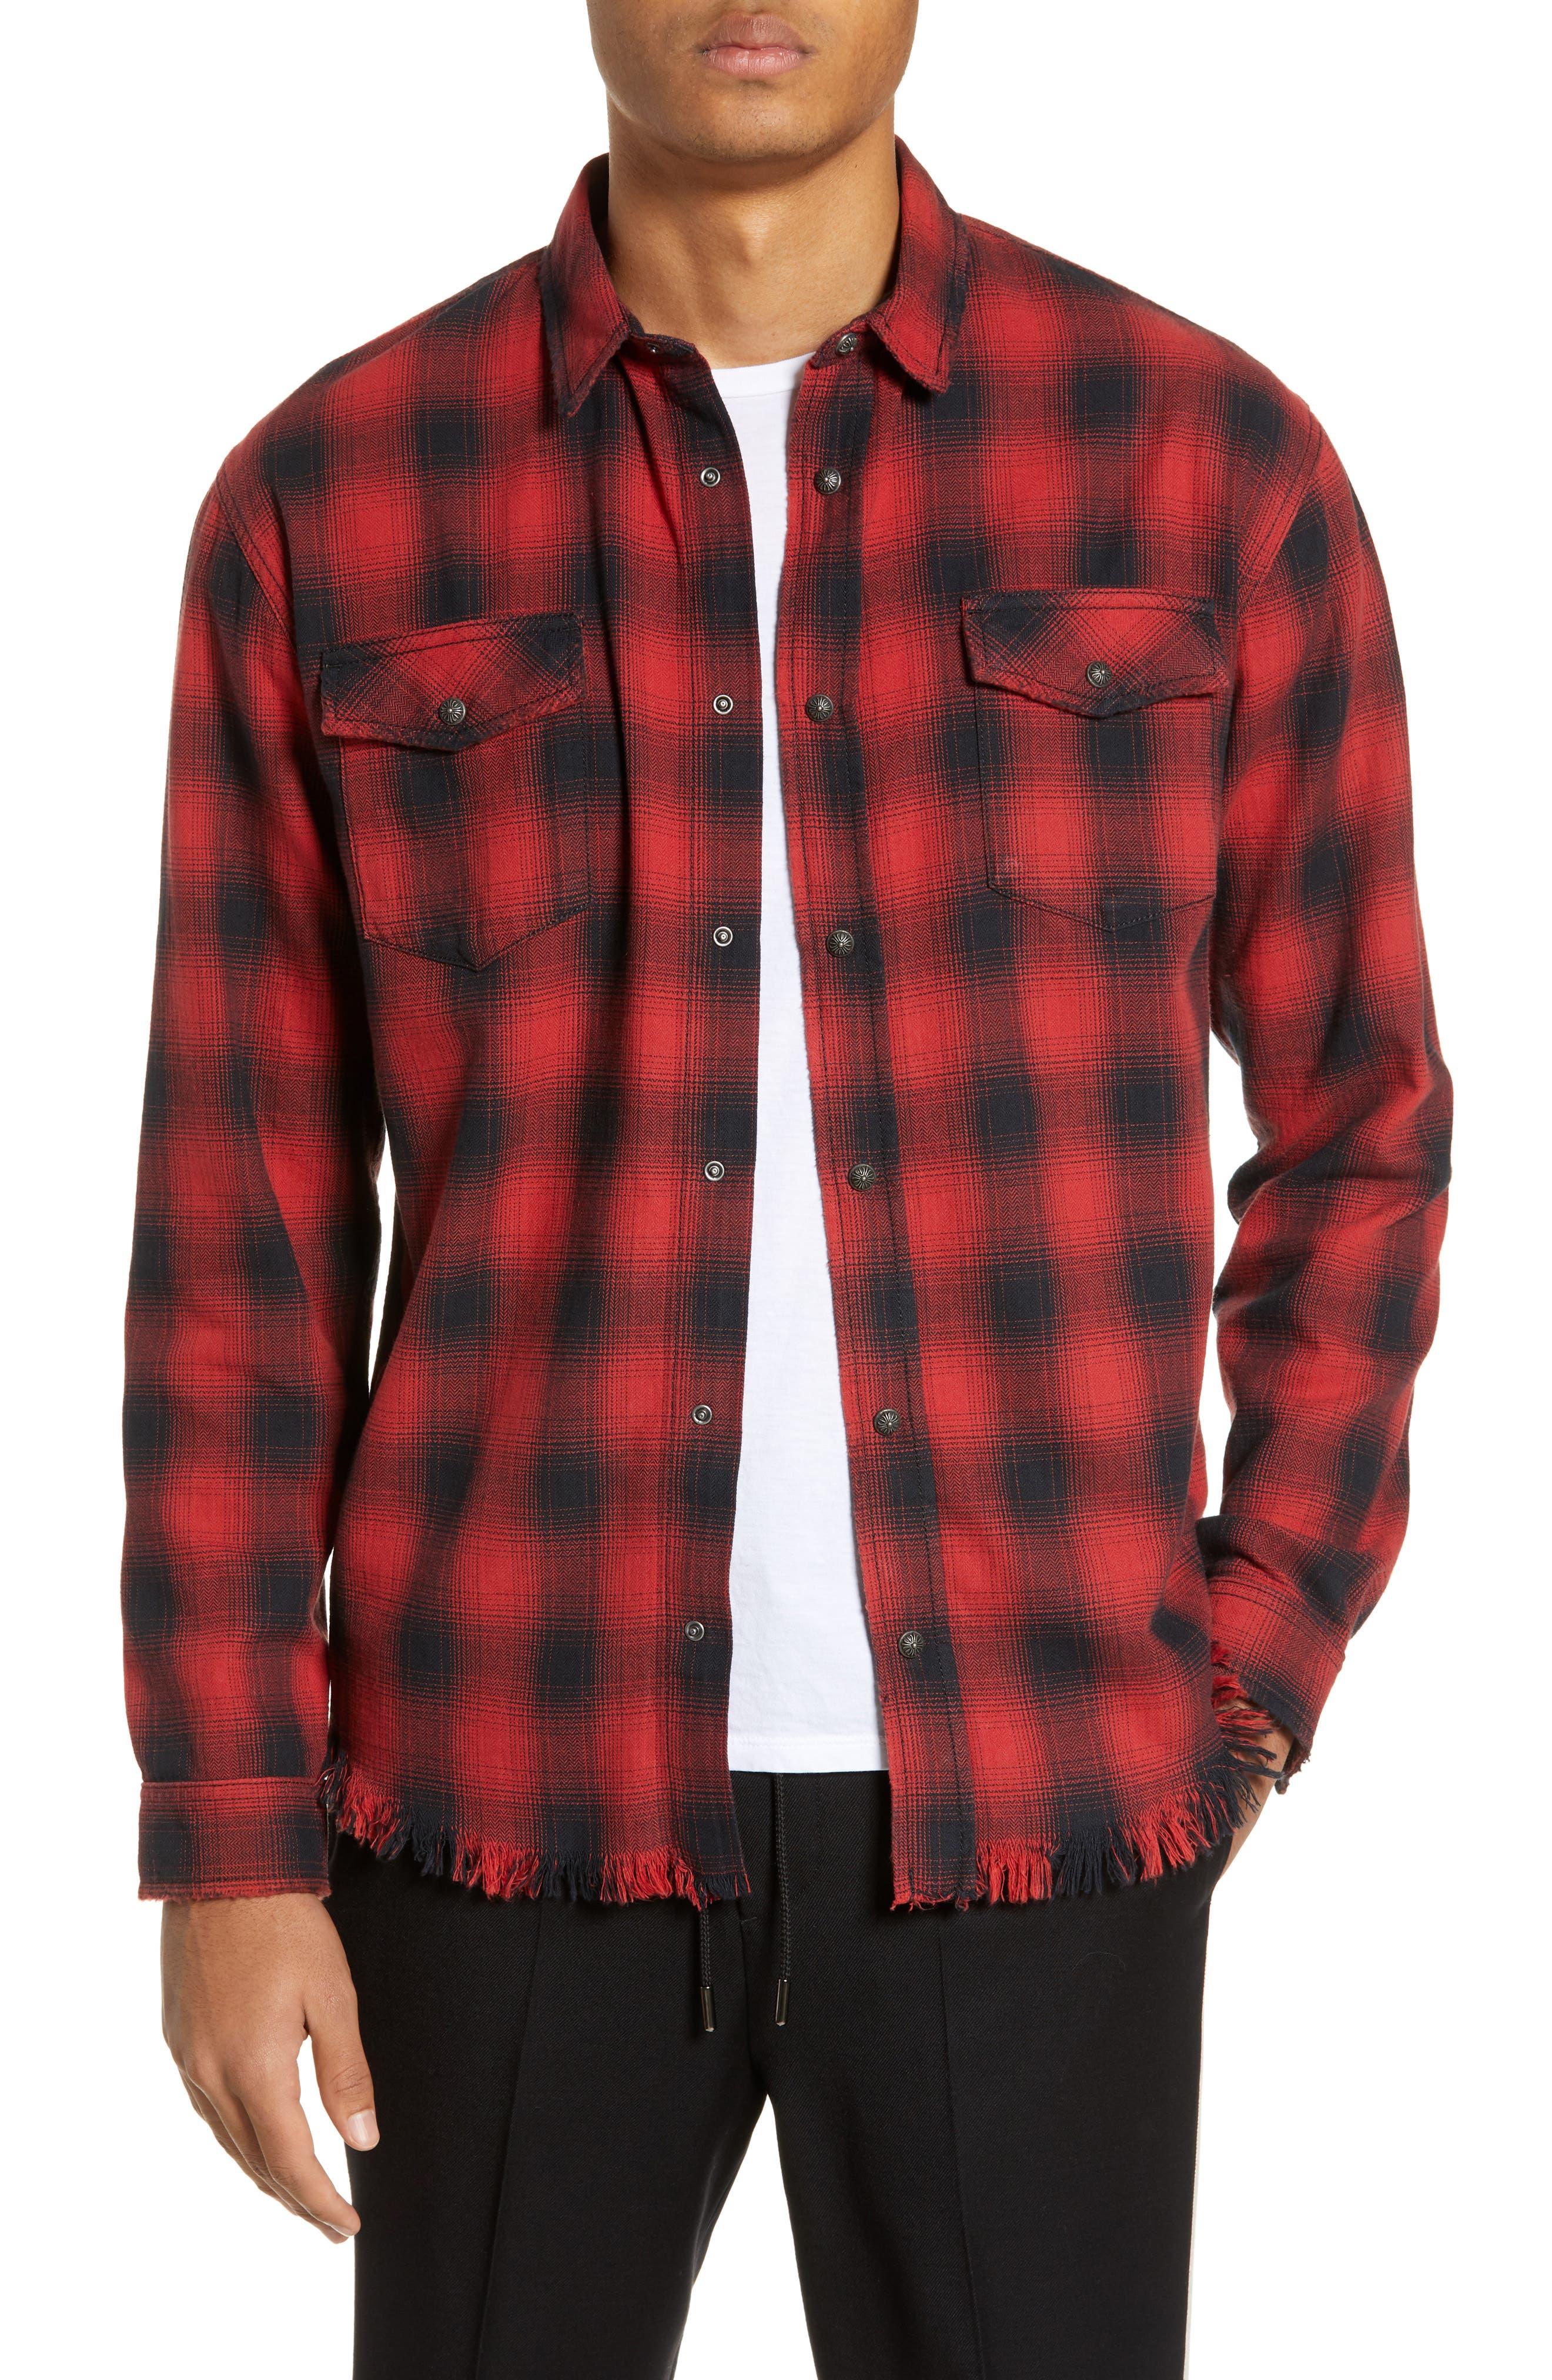 THE KOOPLES Regular Fit Ombré Plaid Shirt, Main, color, RED / BLACK